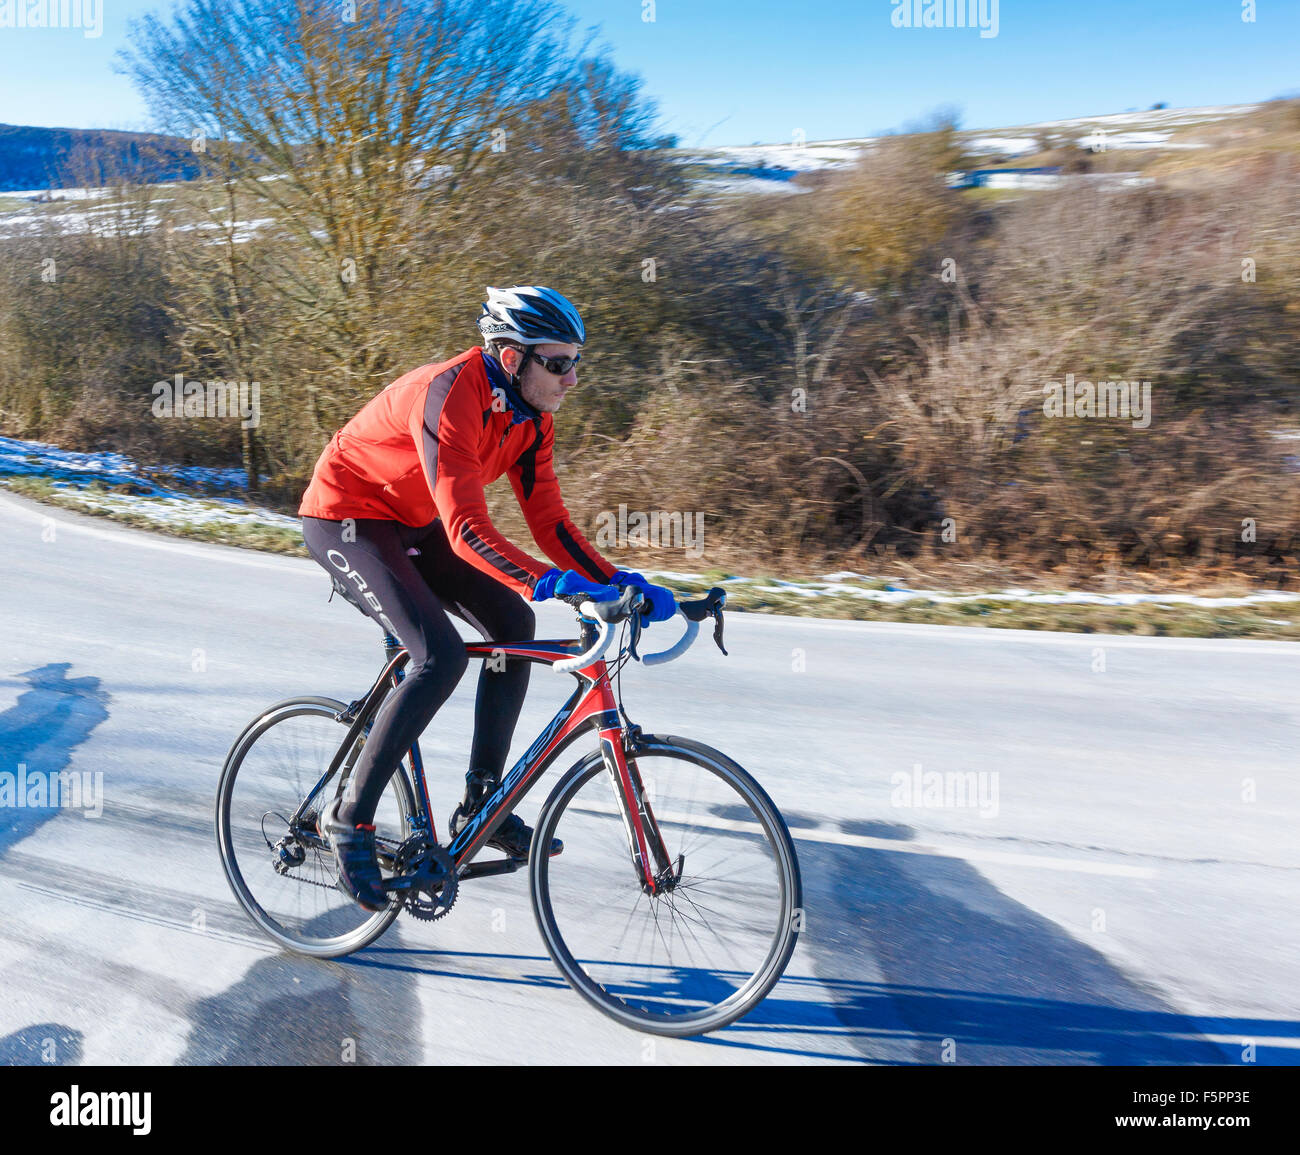 Ciclista en una carretera. Lizarraga pass. Navarra, España, Europa. Imagen De Stock